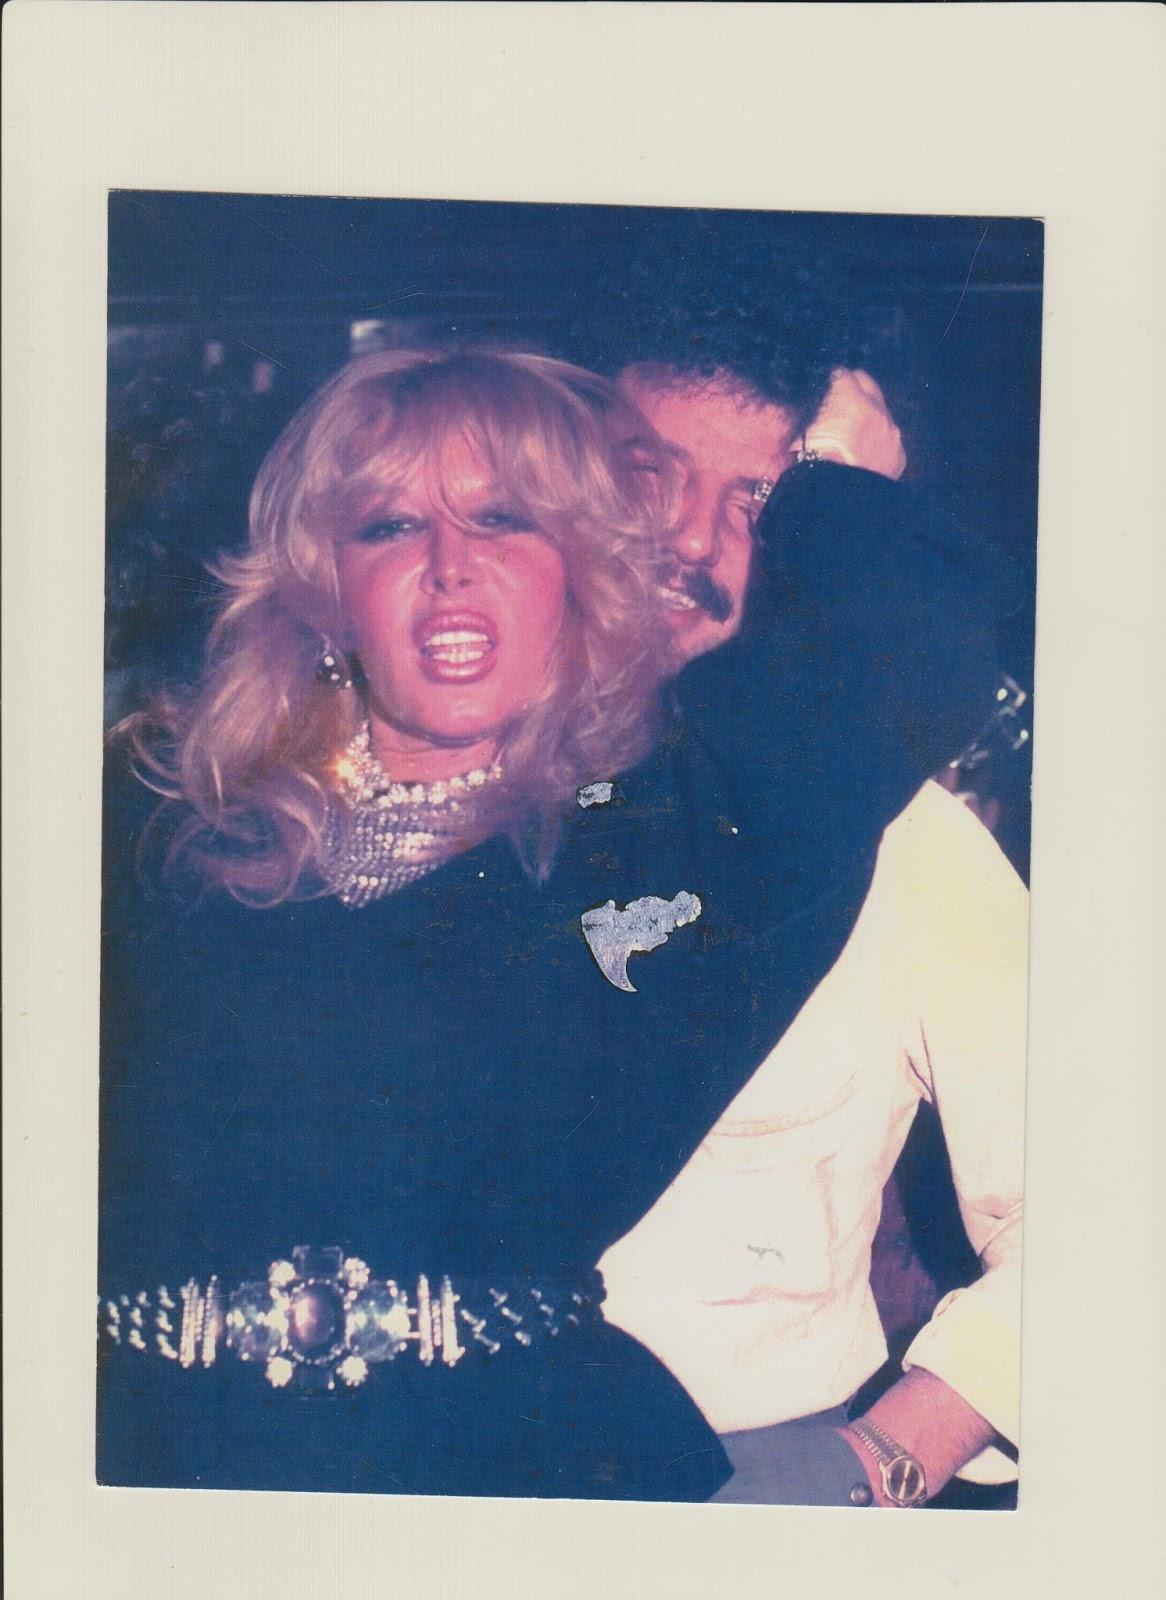 Aditi Sharma 2007,Dannii Minogue Hot photos Bonnie Wright (born 1991),Phyllis Kirk